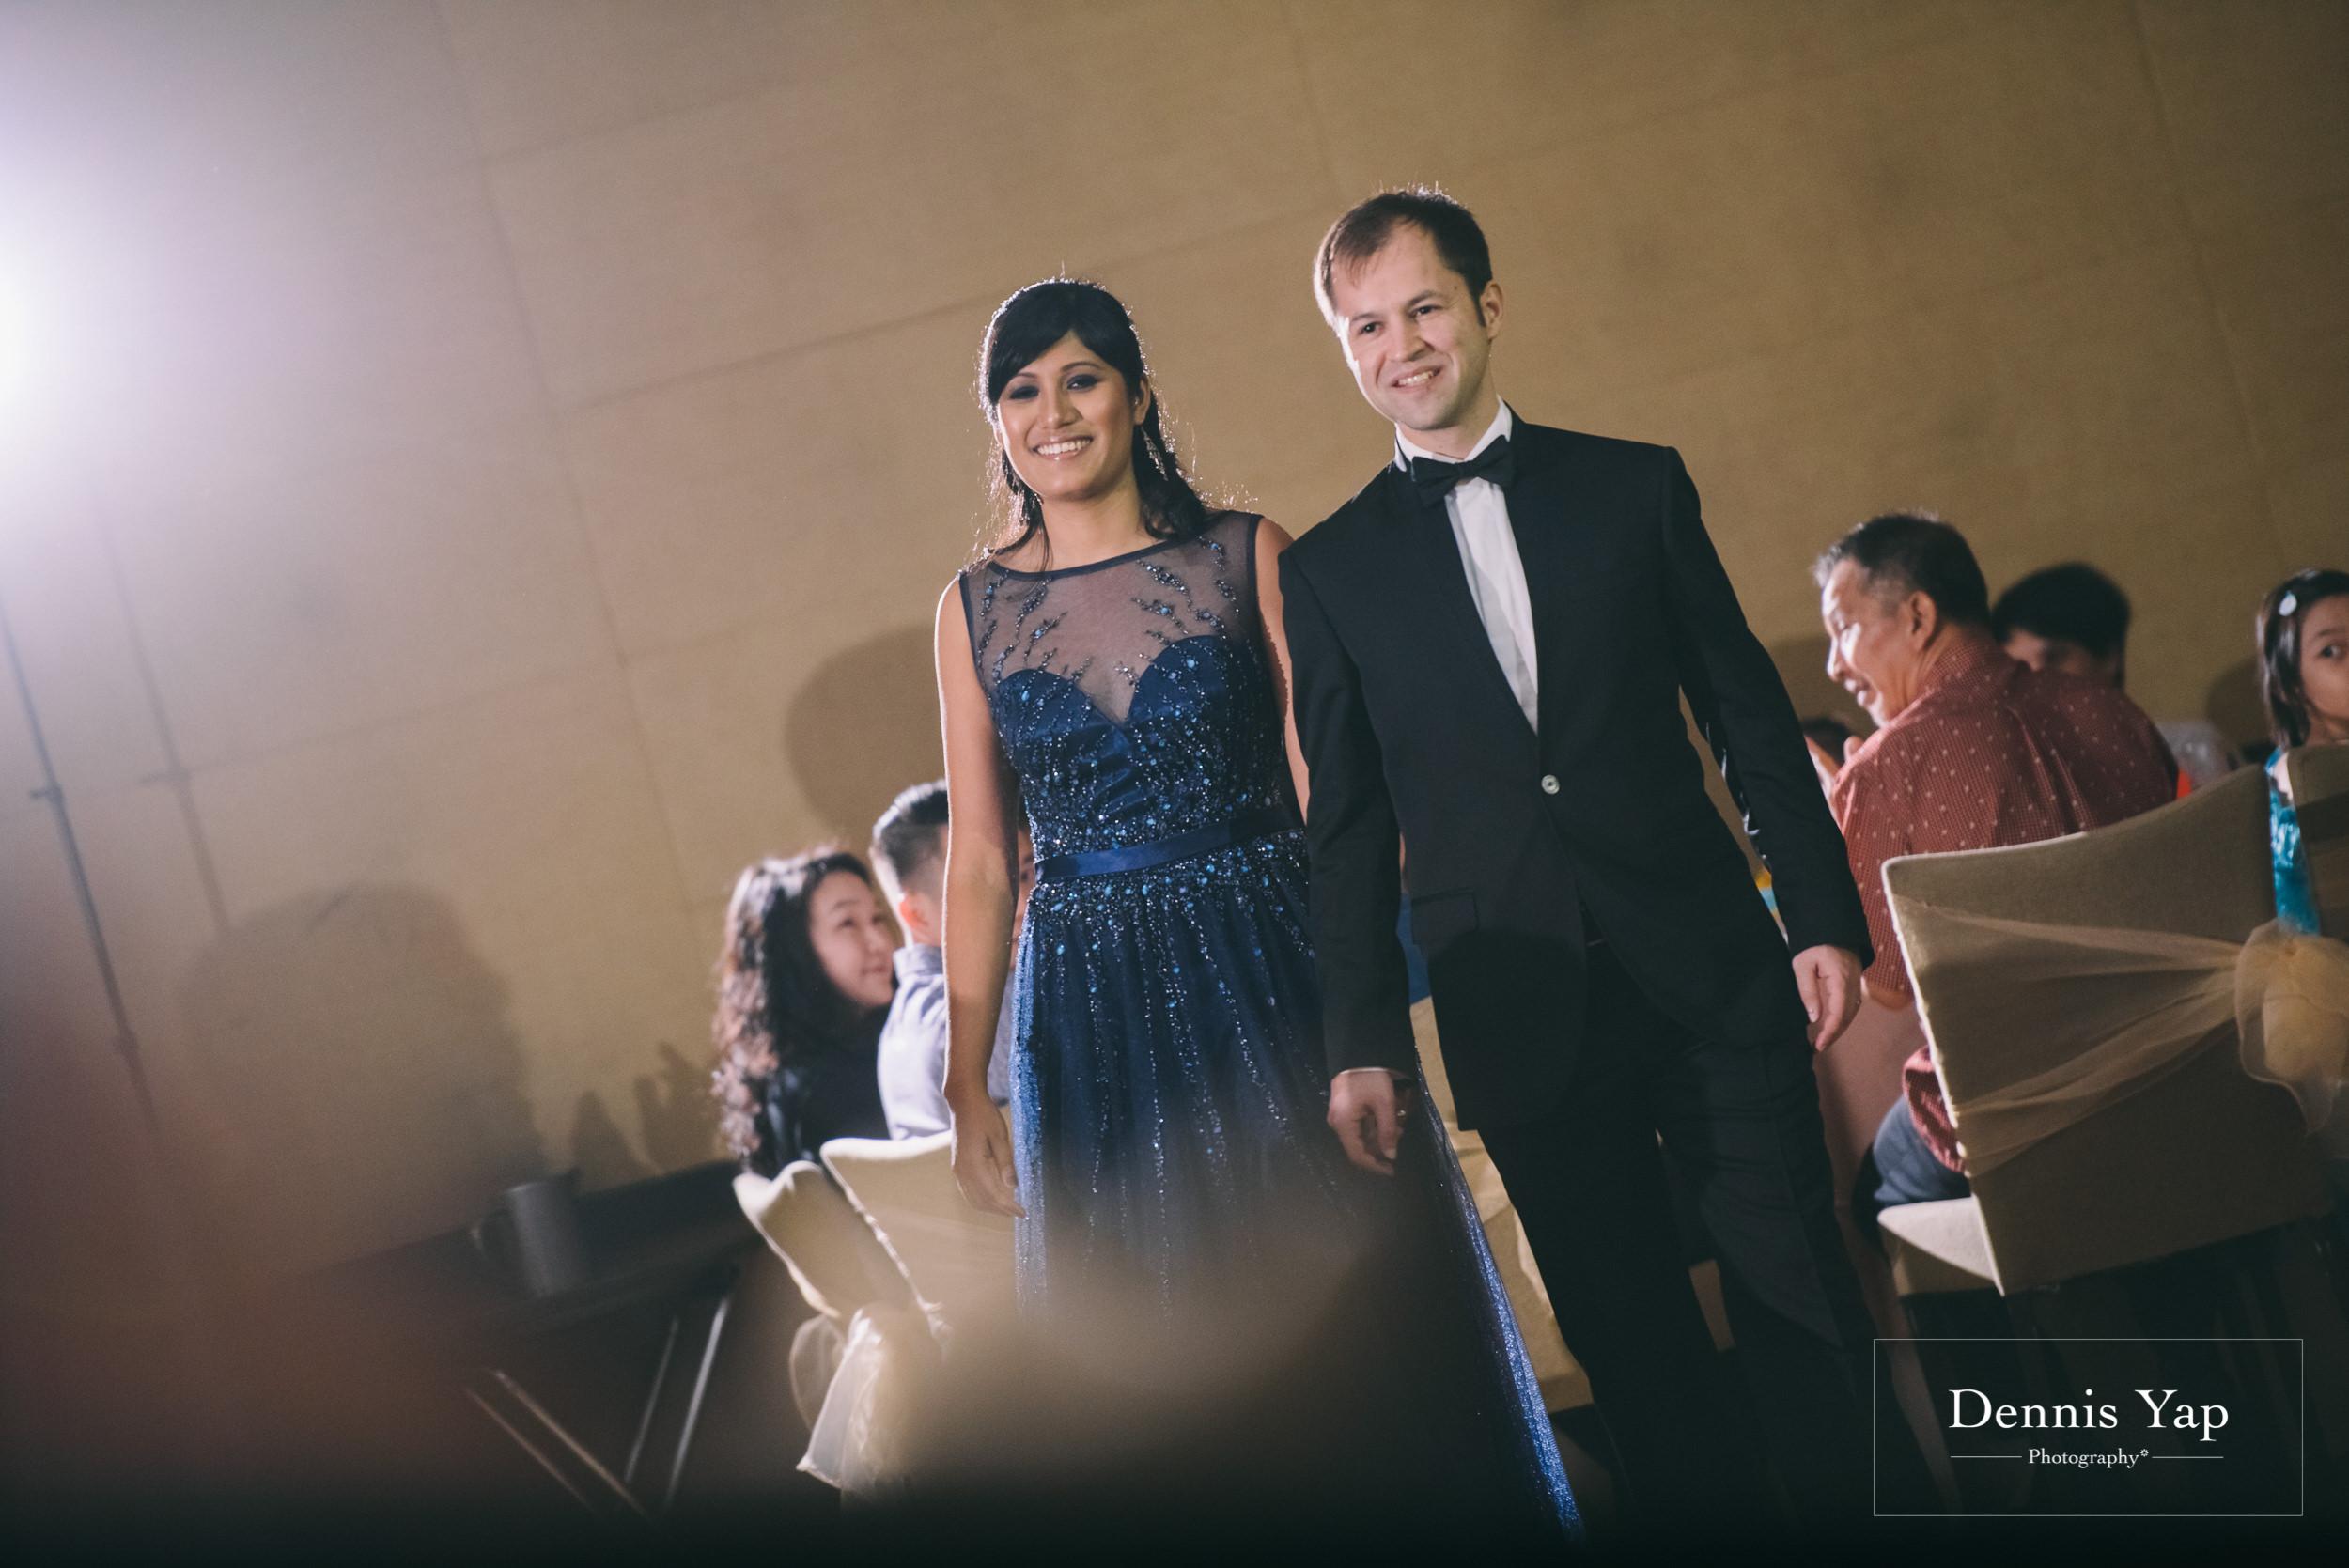 nejd leena slovenian wedding reception malaysia wedding photographer dennis yap premier hotel klang-4.jpg